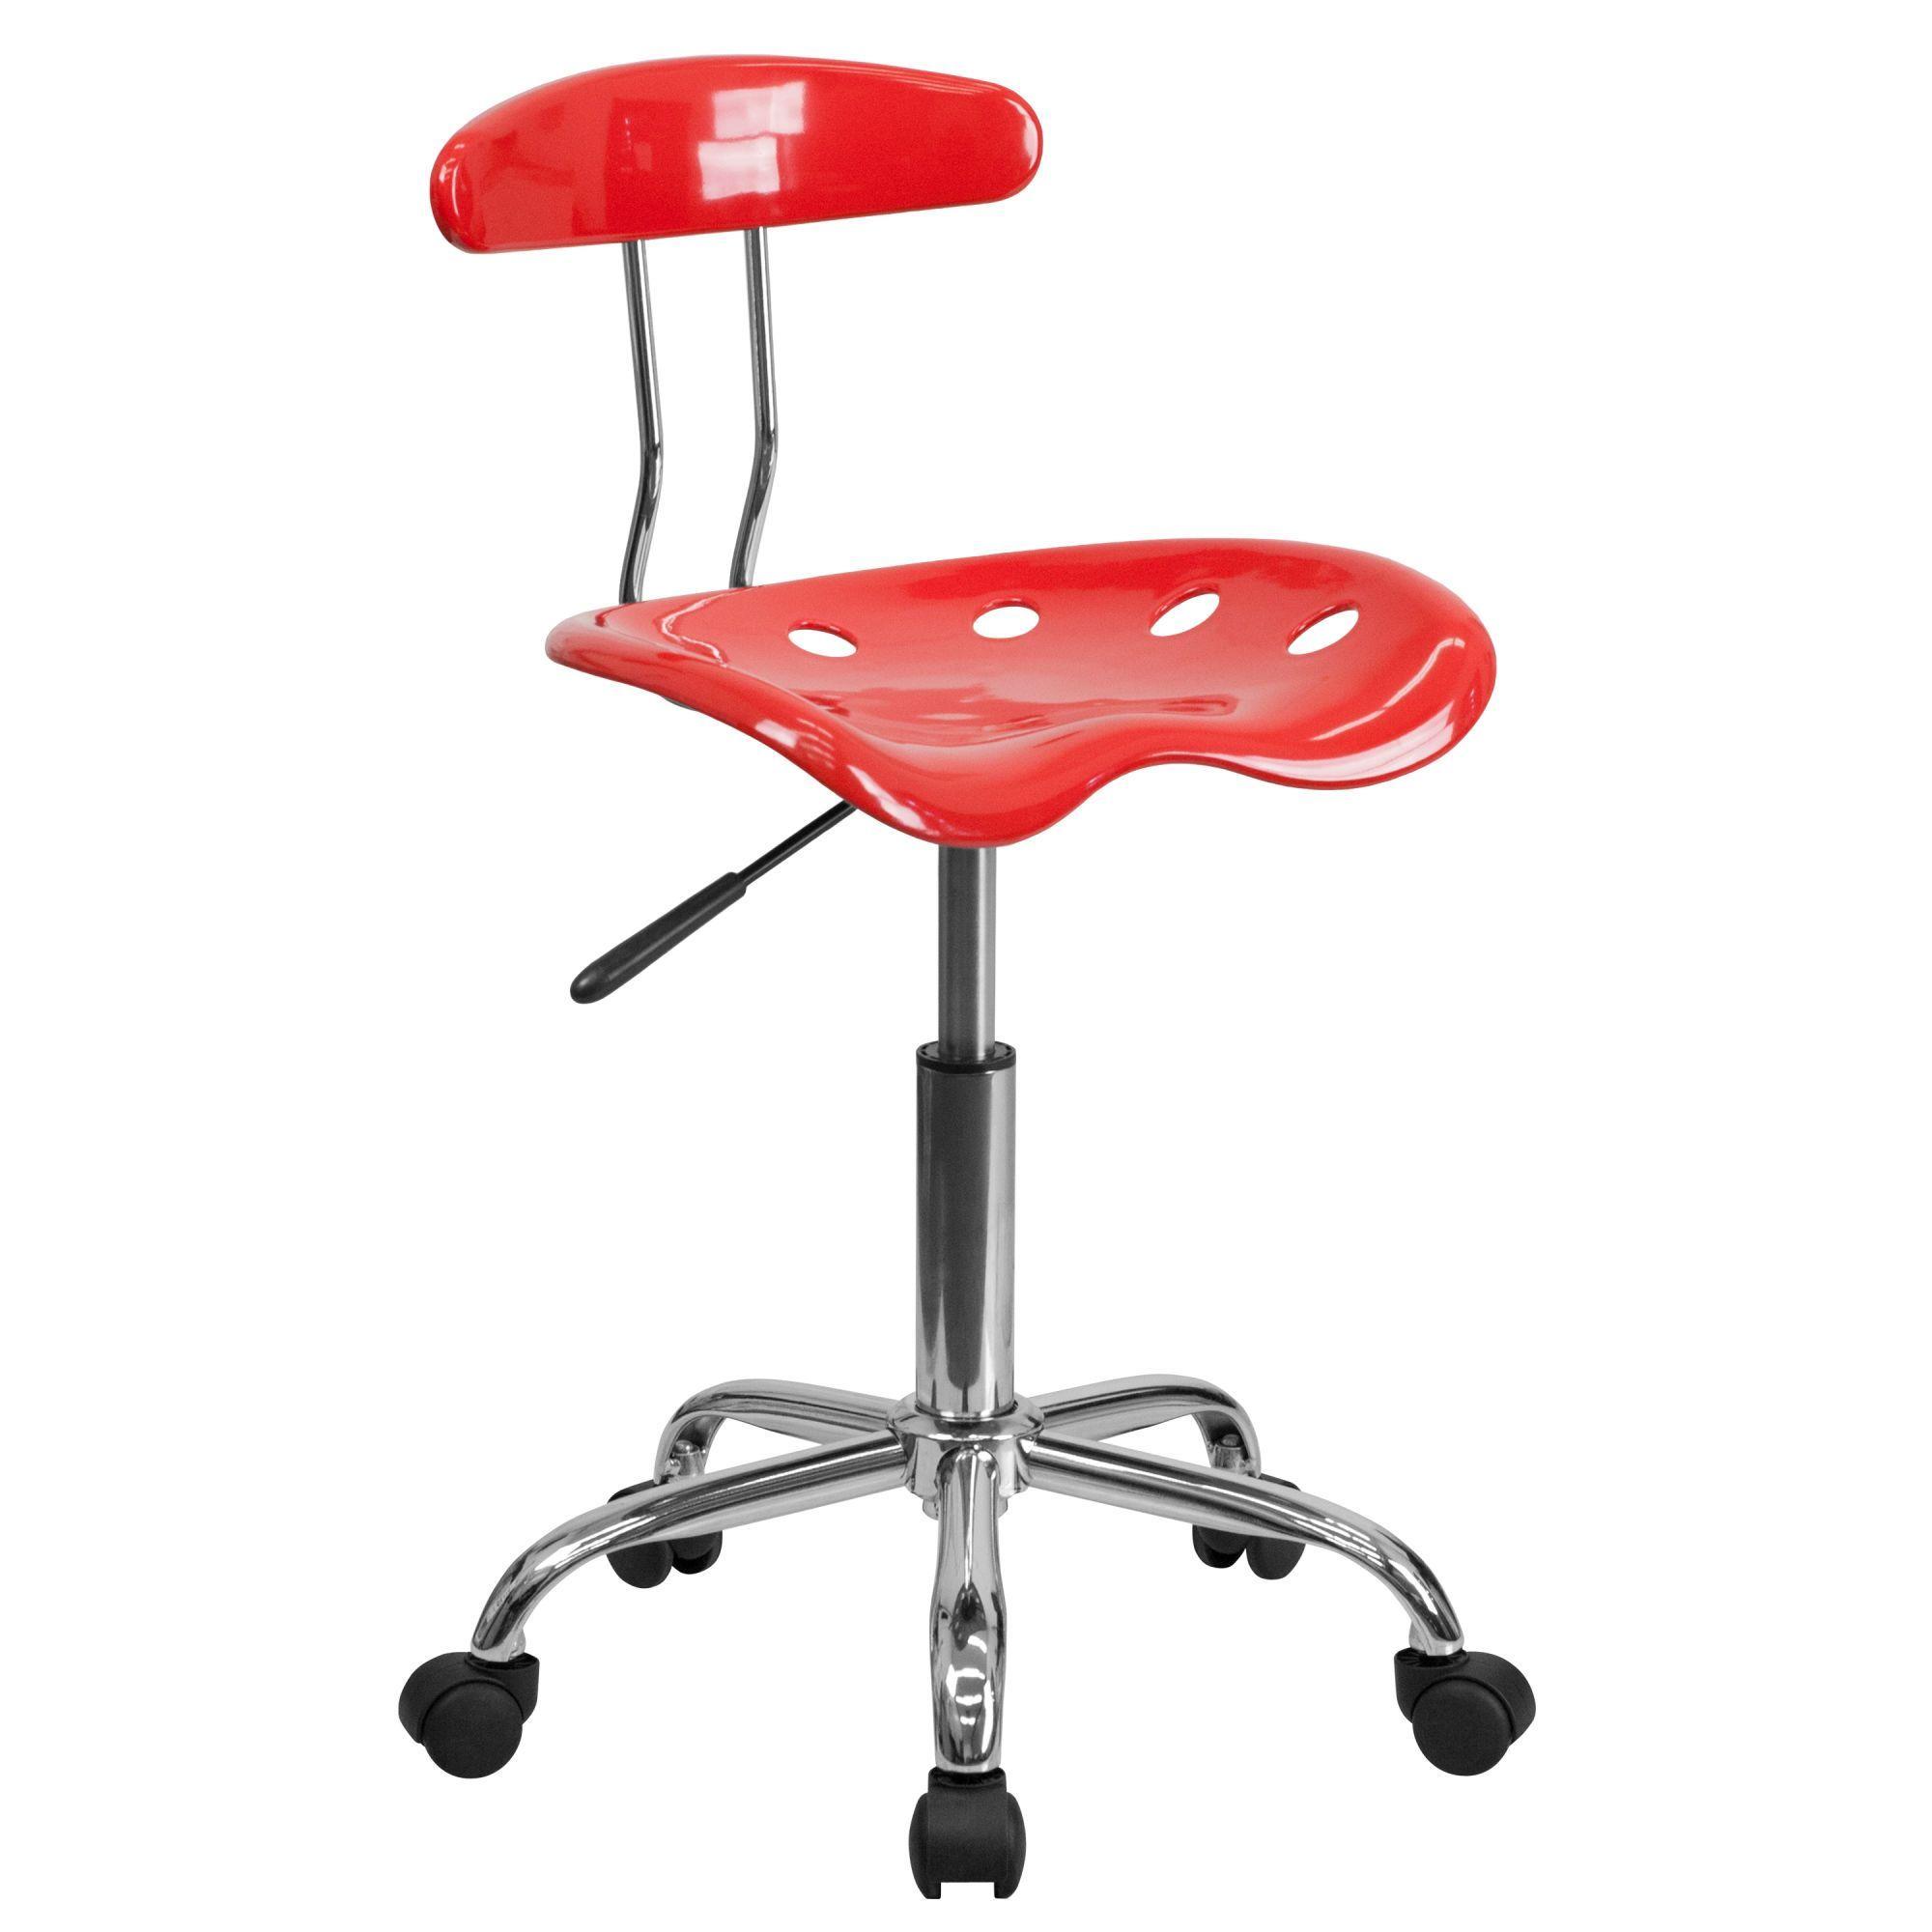 Adjustable Swivel Task Chair – Cherry Tomato